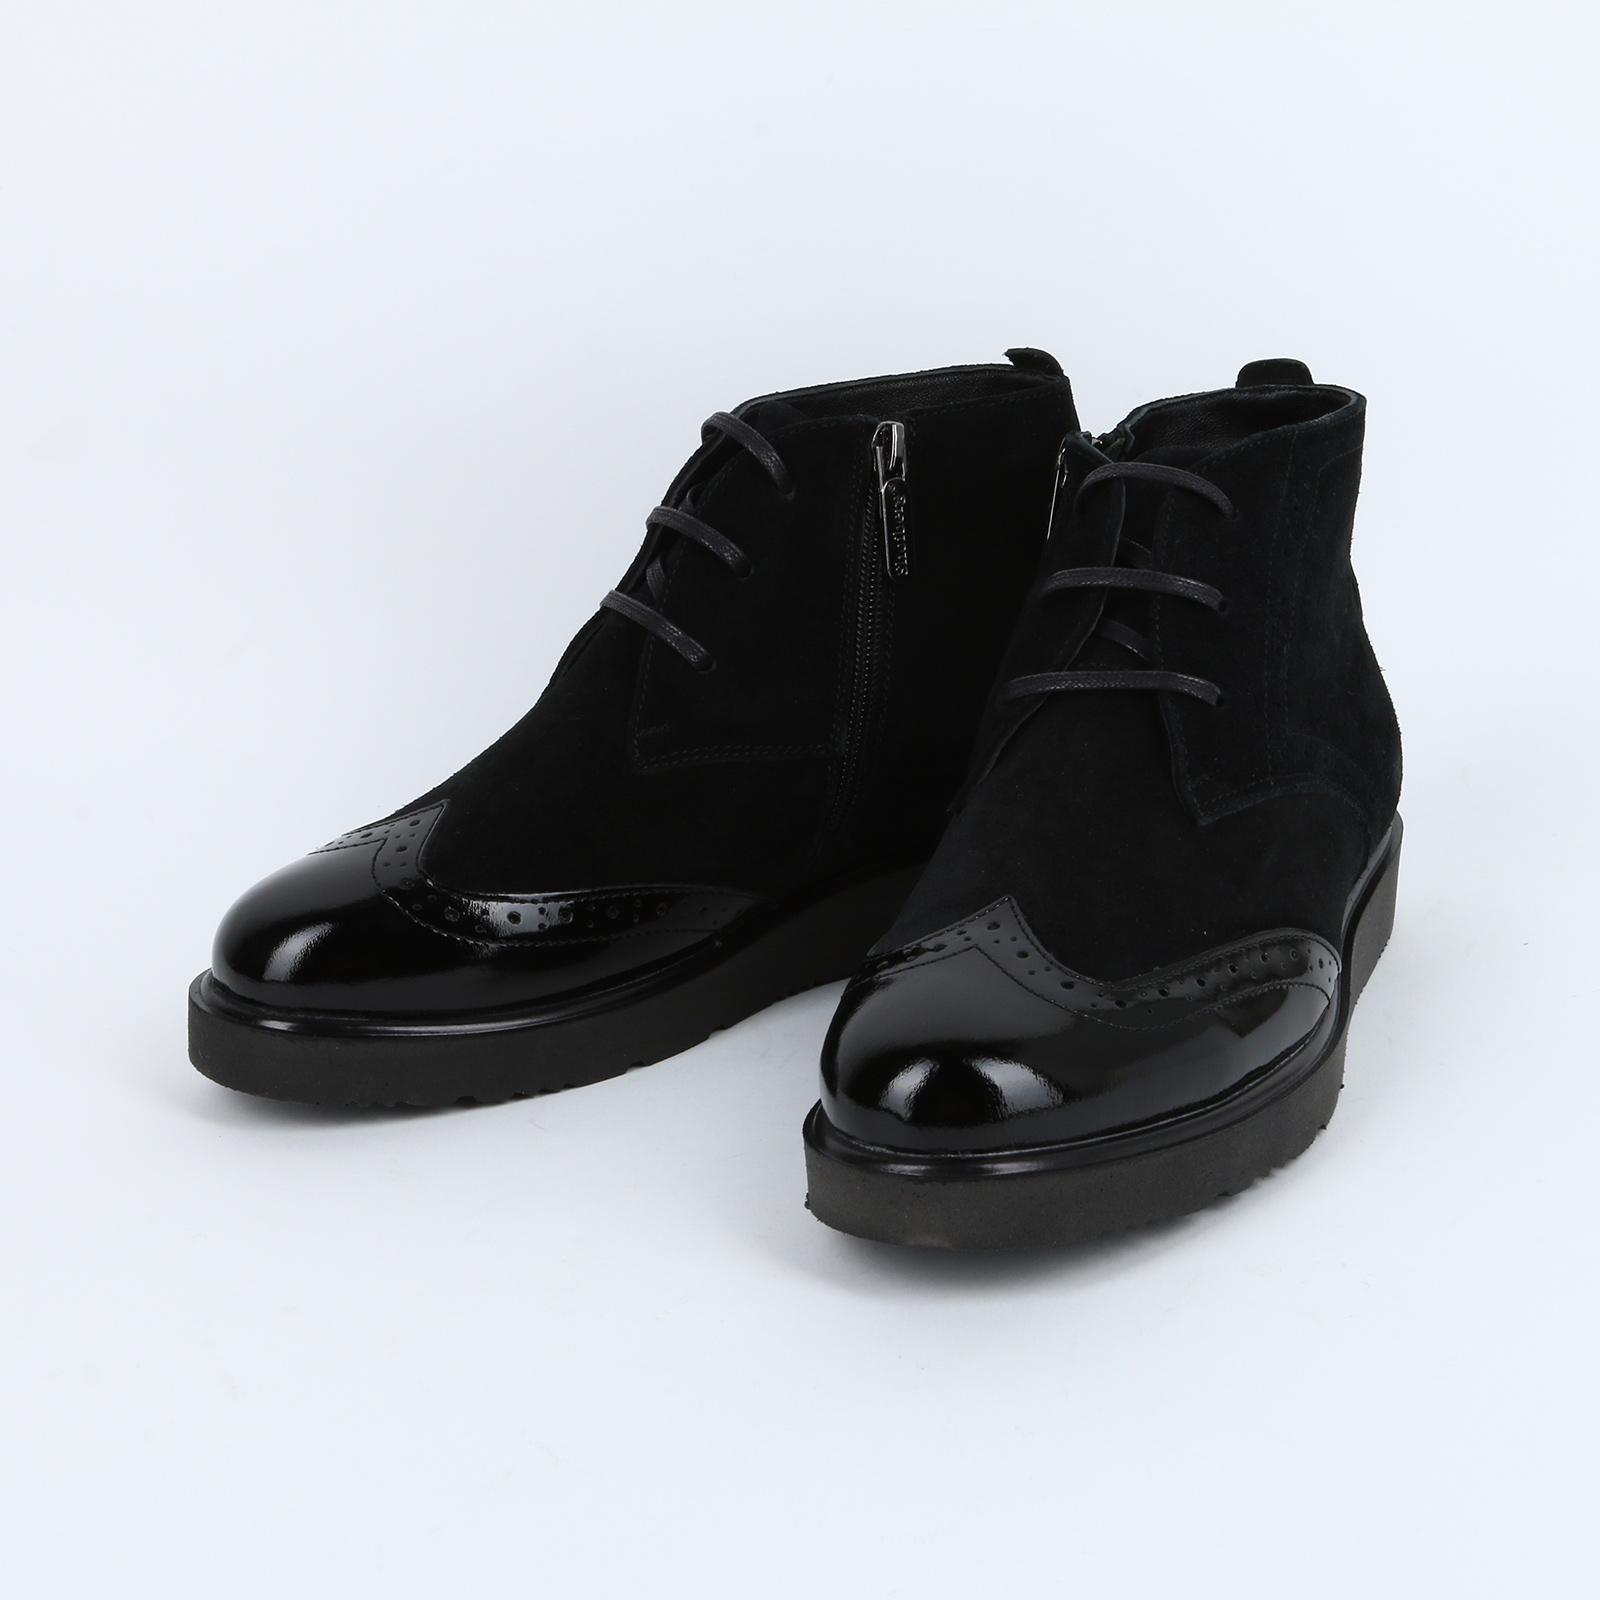 Жeнcкиe ботинки на шнуровке мужские ботинки shoiberg